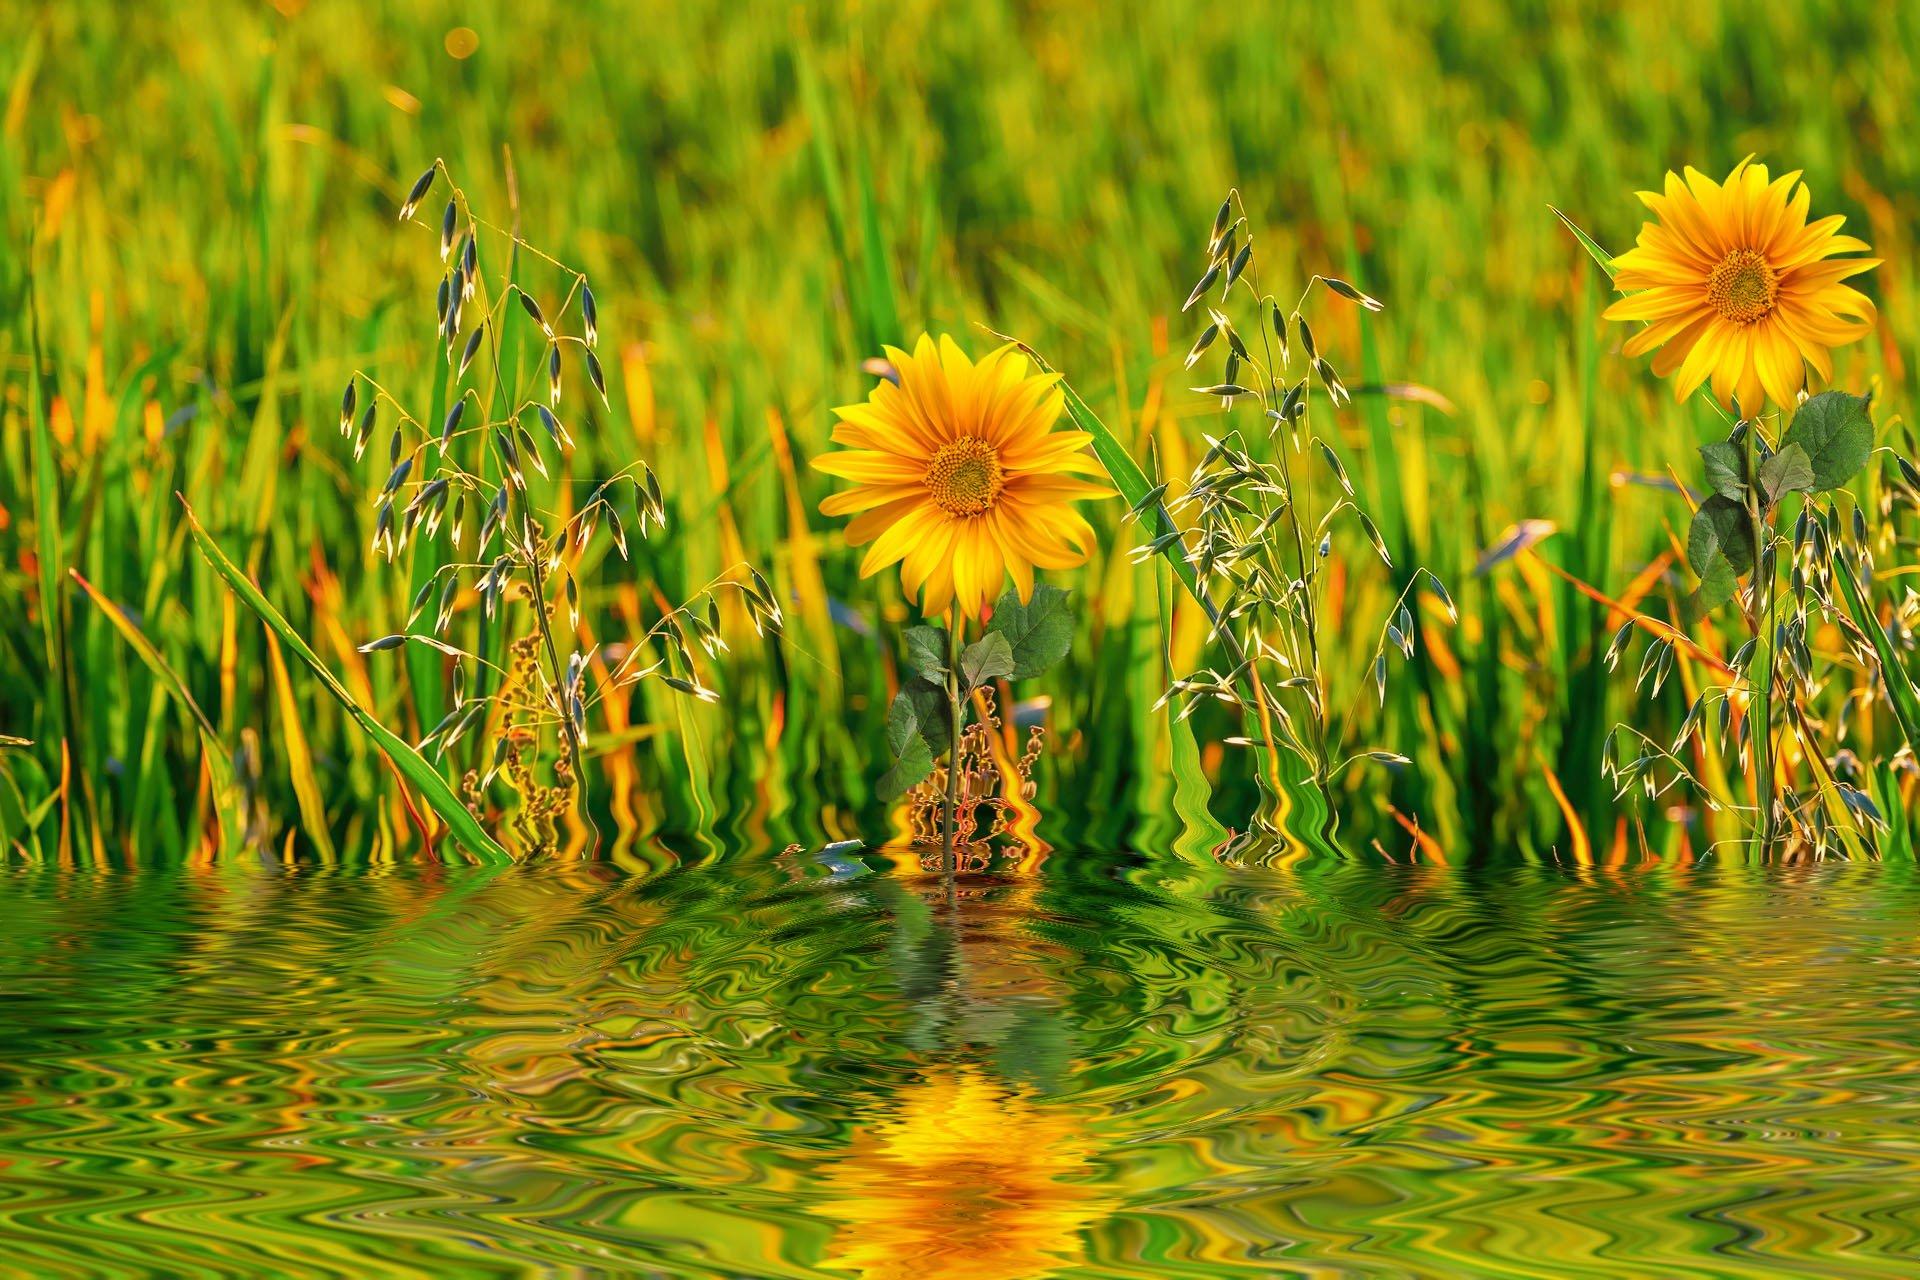 Flower Reflected In The Water Fondo De Pantalla Hd Fondo De